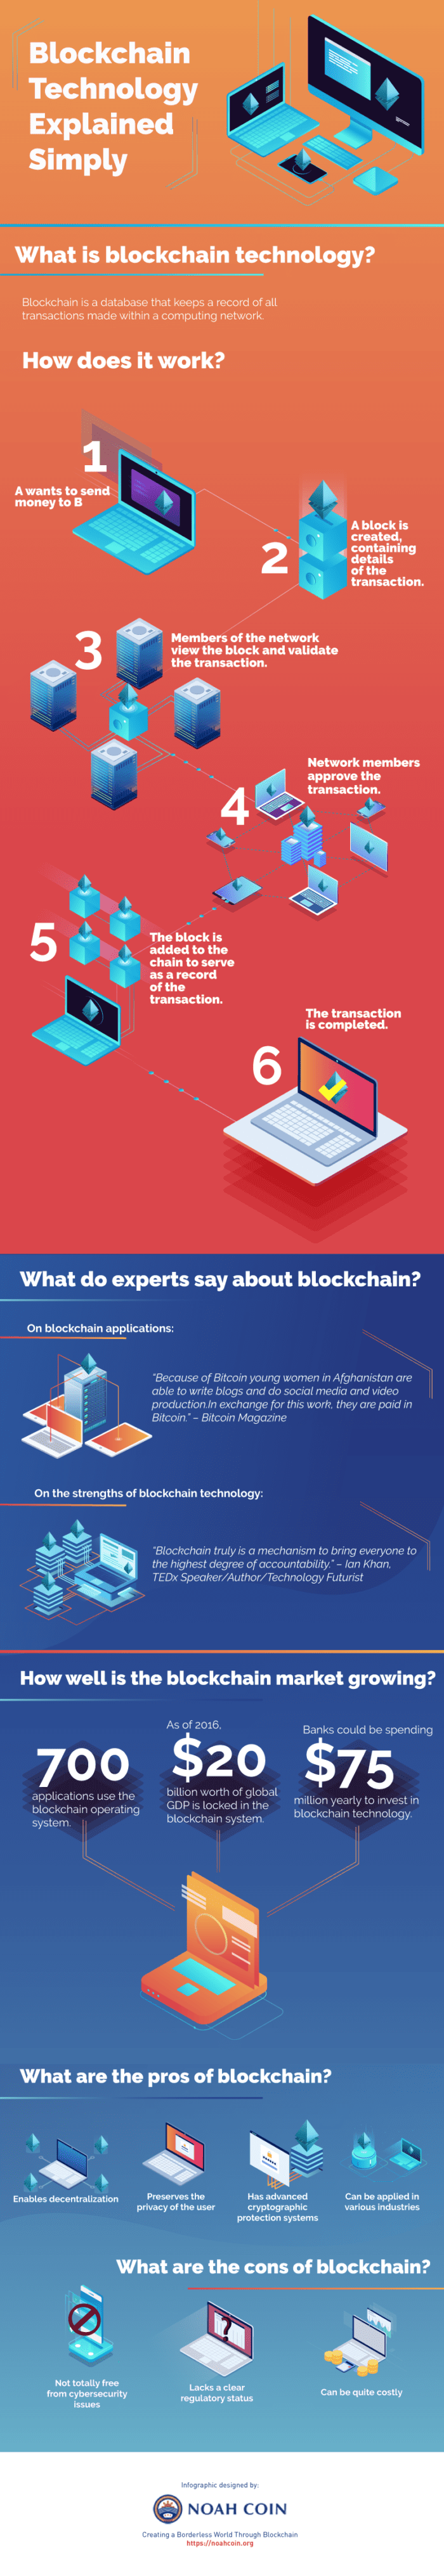 Blockchain technology explained simply